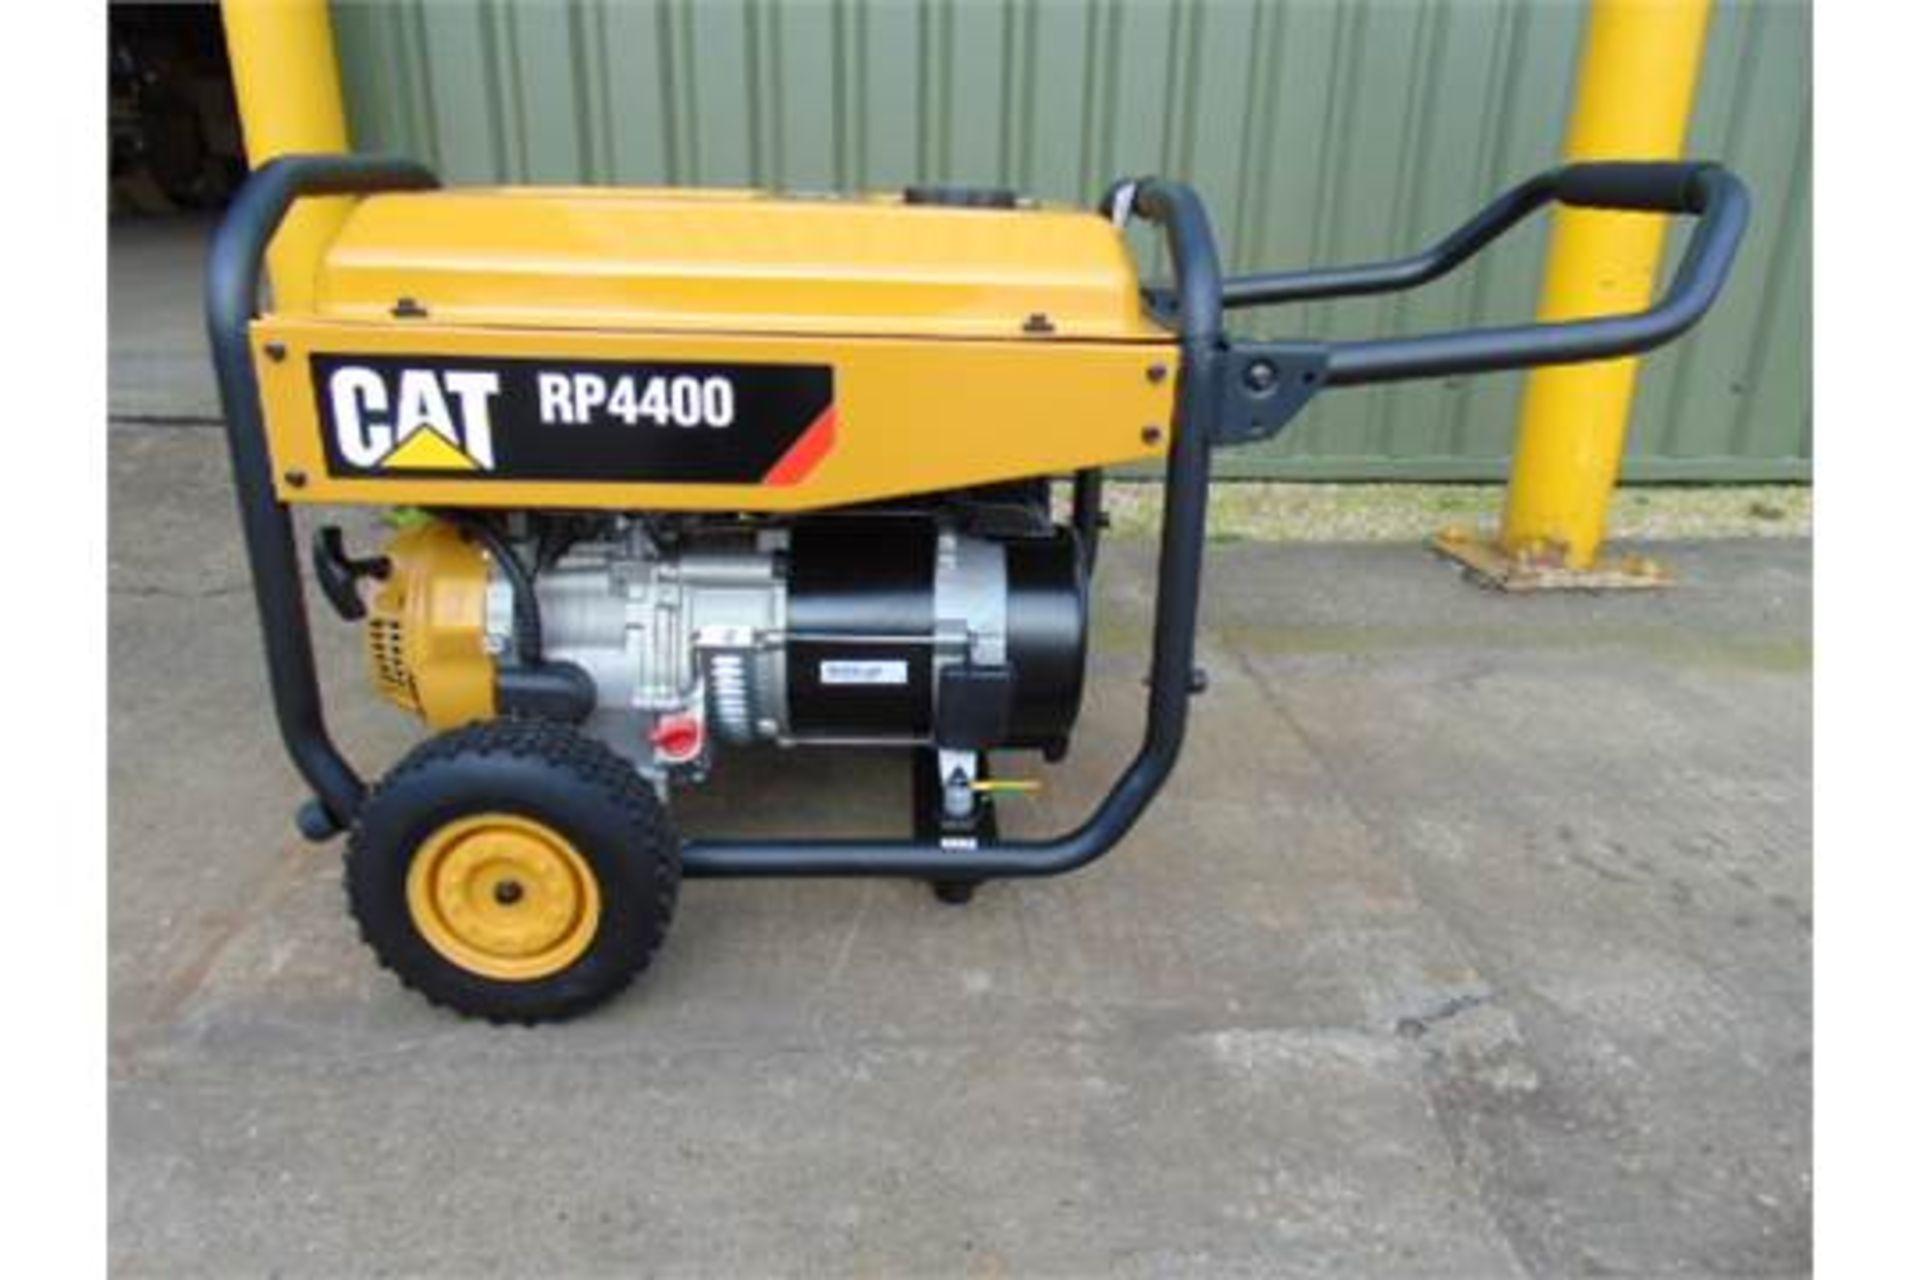 Lot 47 - UNISSUED Caterpillar RP4400 Industrial Petrol Generator Set